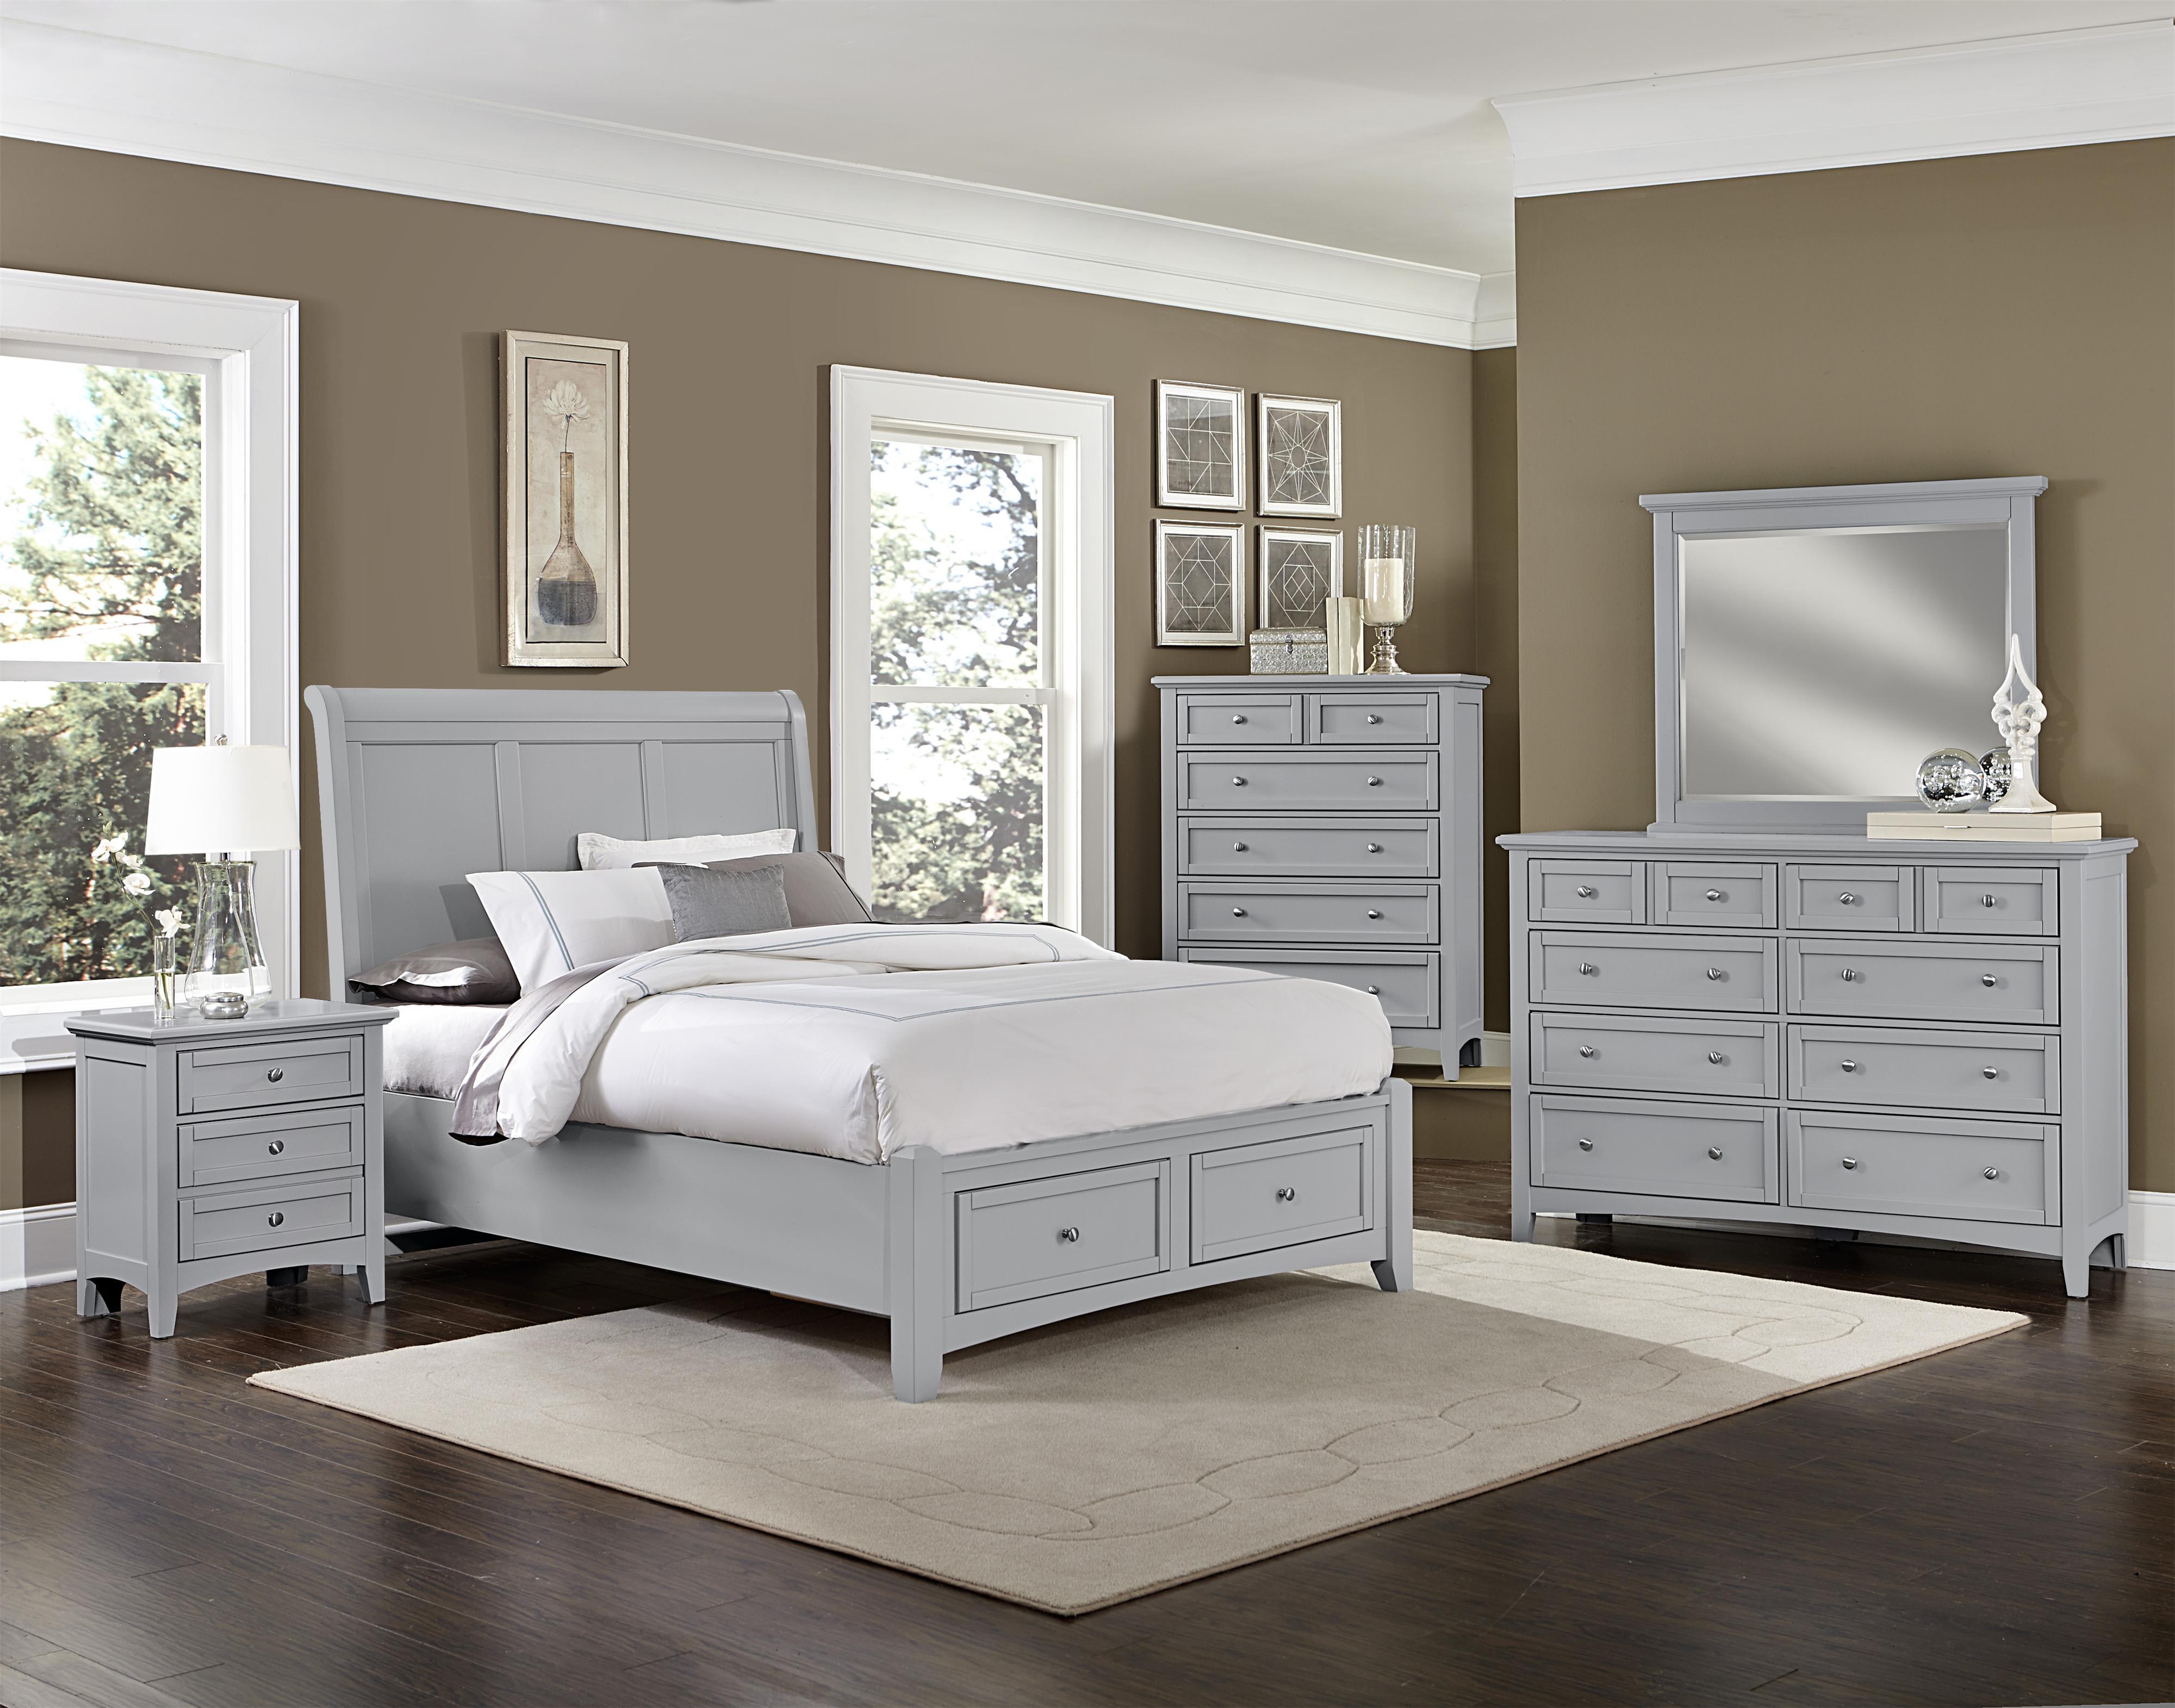 Vaughan Bassett Bonanza Full Bedroom Group | Powell\'s Furniture and ...